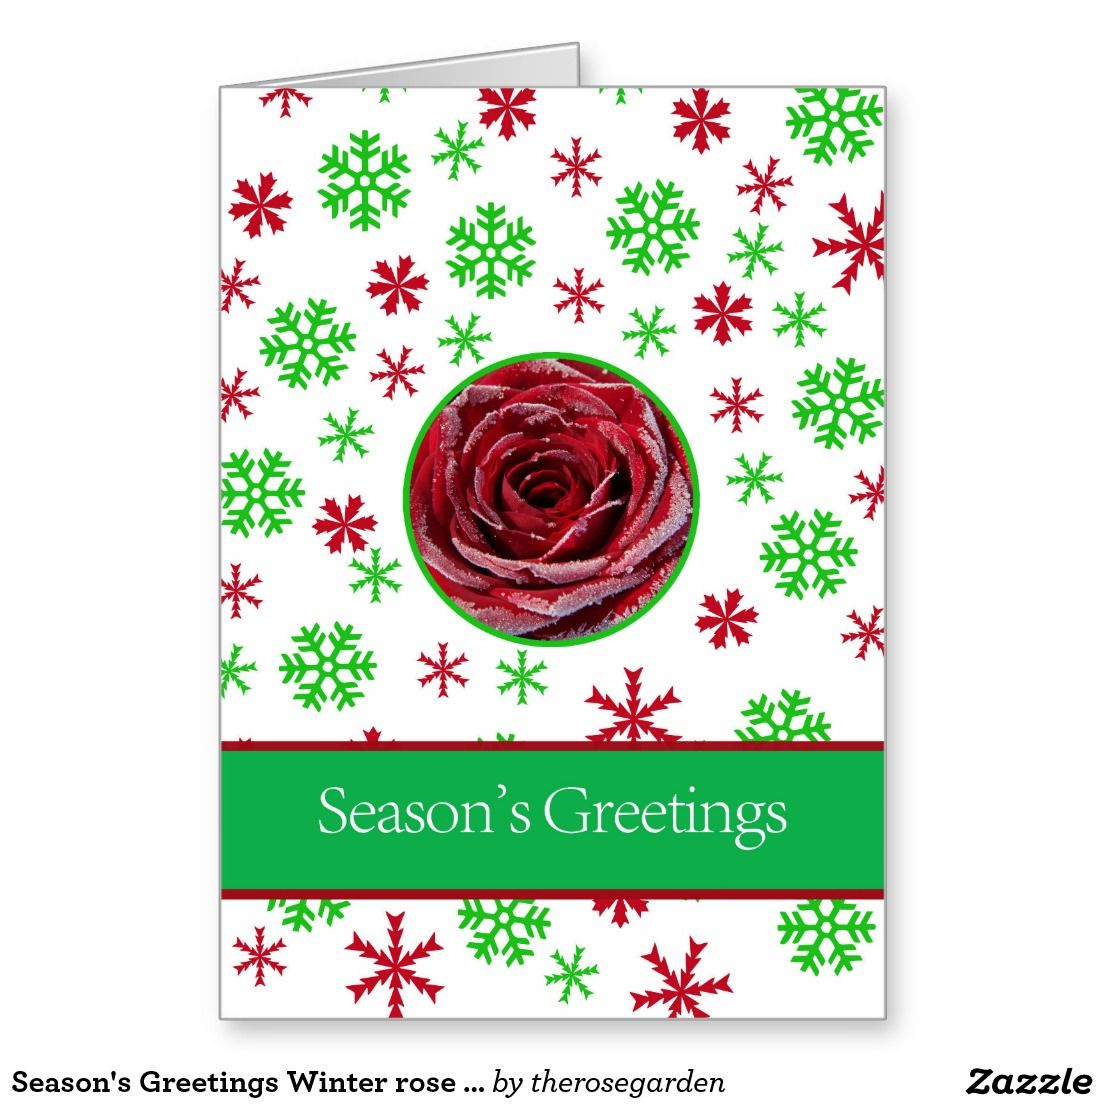 Seasons greetings winter rose christmas card shared board for seasons greetings winter rose christmas card kristyandbryce Image collections